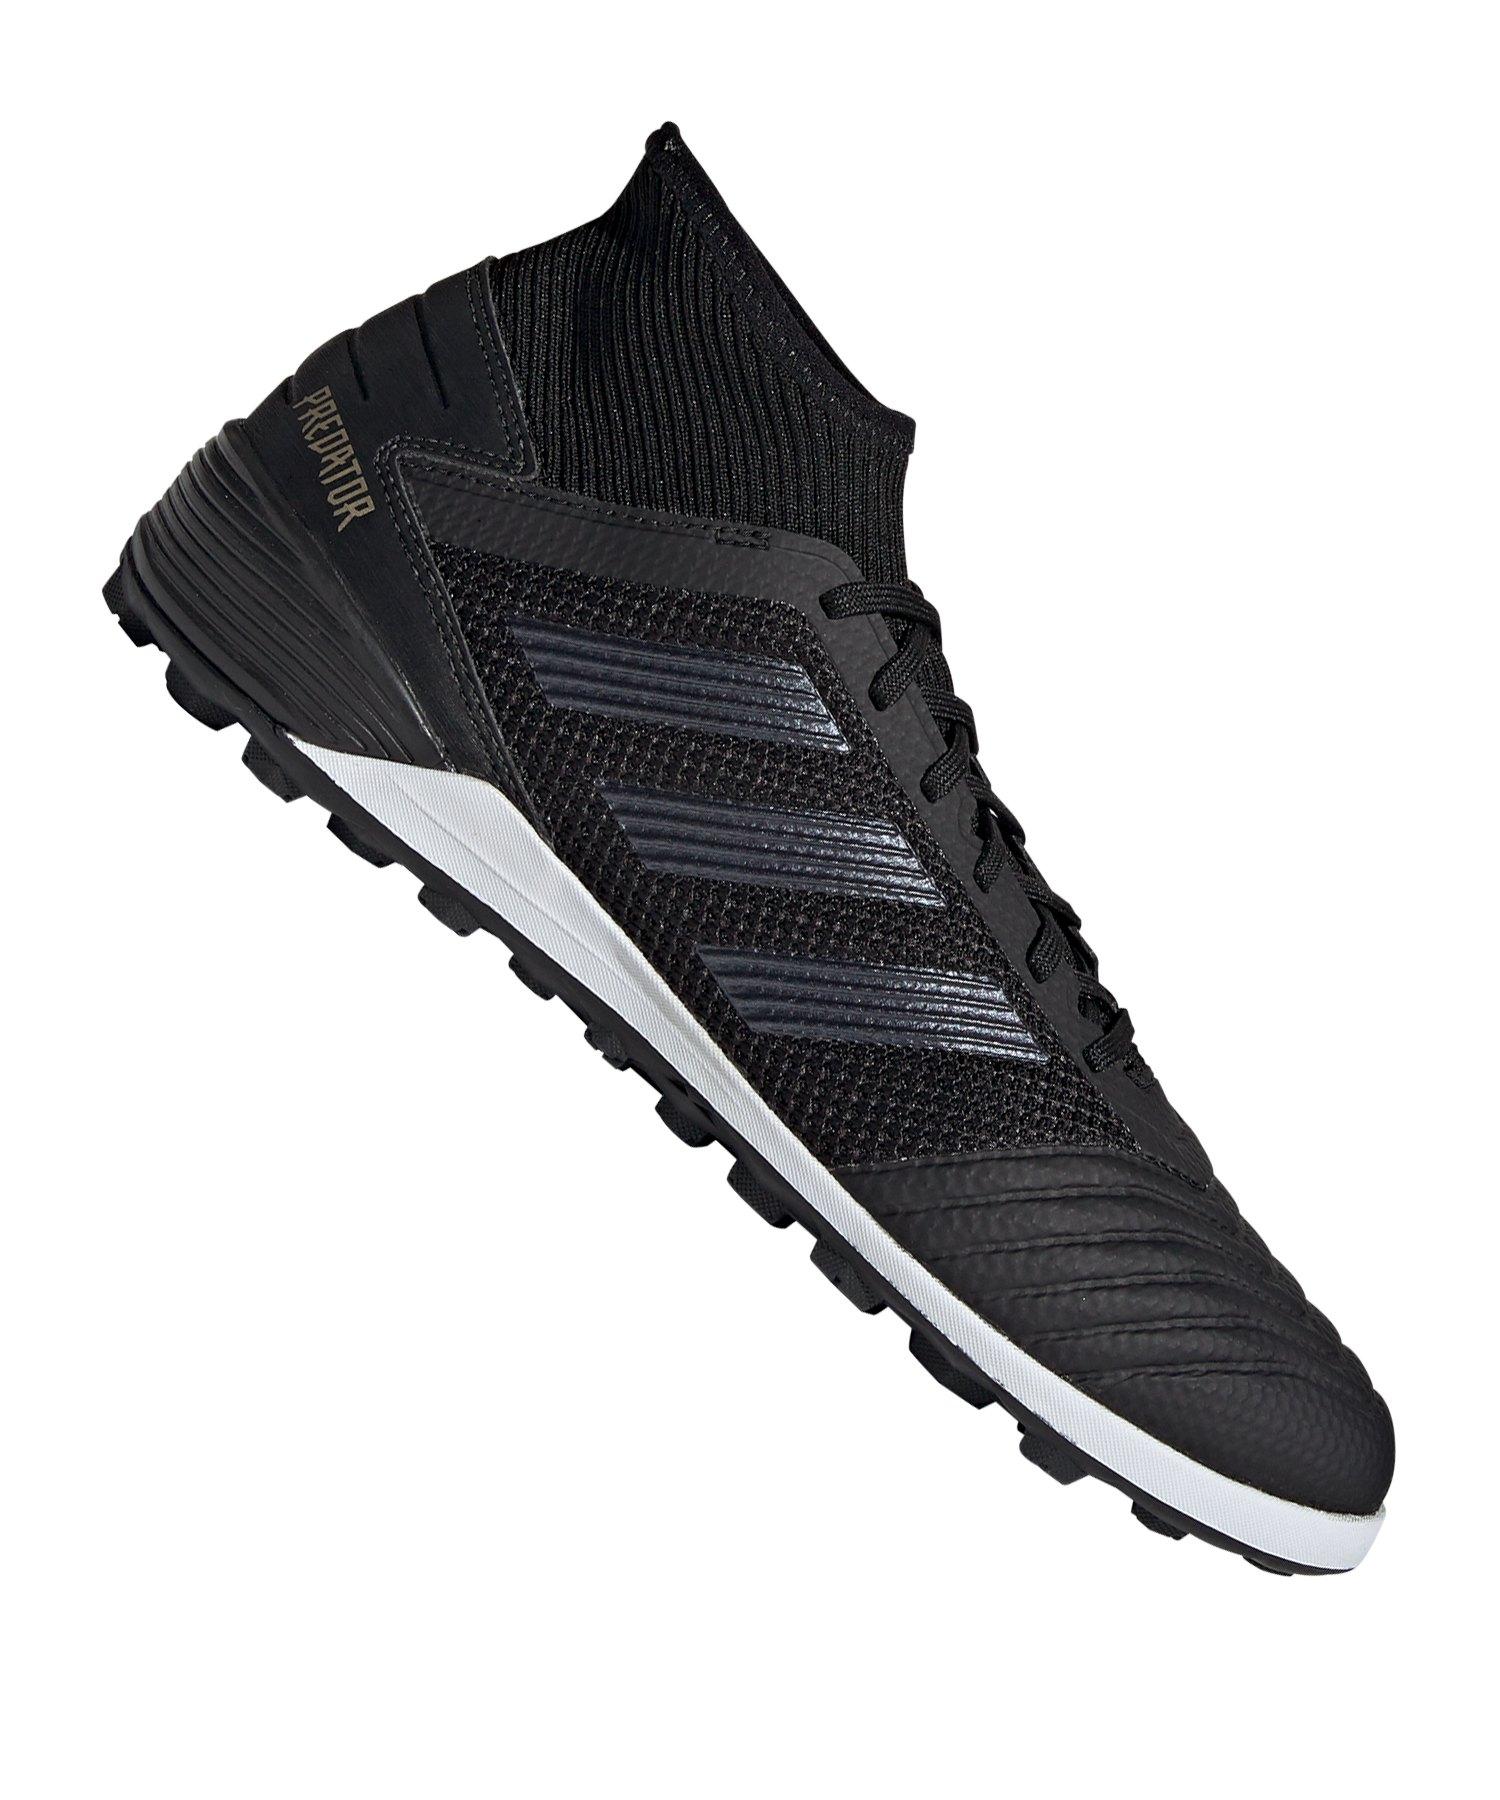 adidas Predator 19.3 TF Schwarz Gold